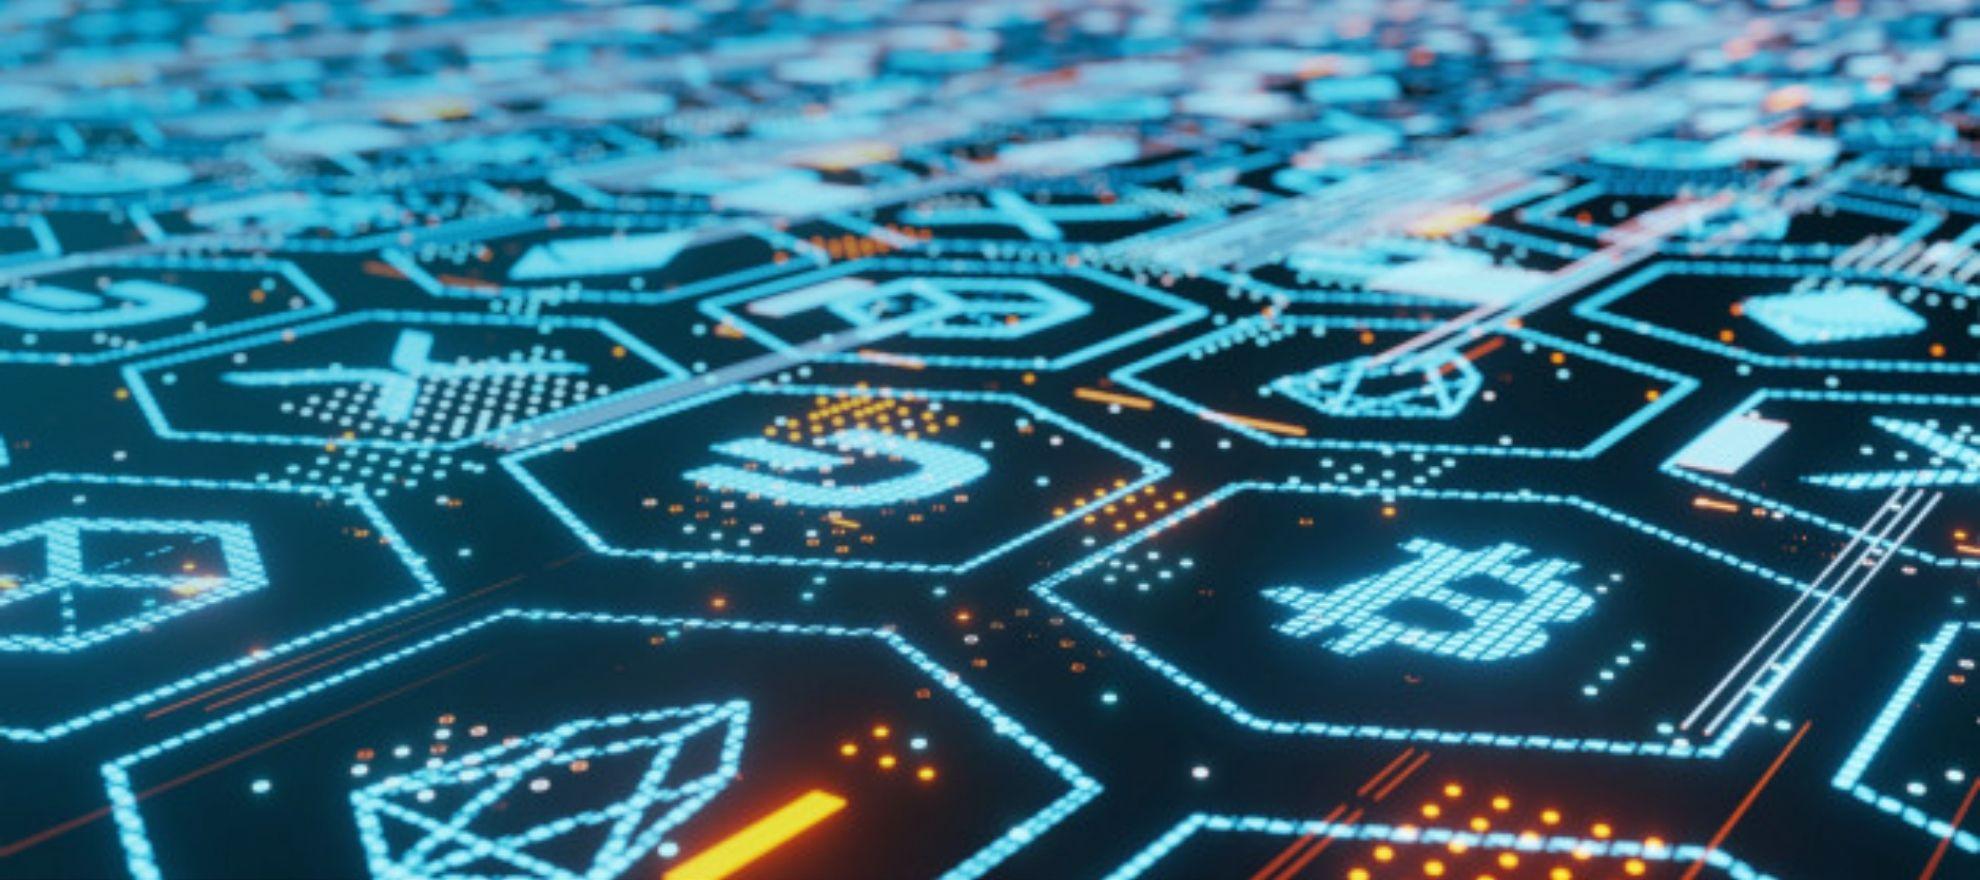 Token: O que é e qual a diferença para criptomoeda?